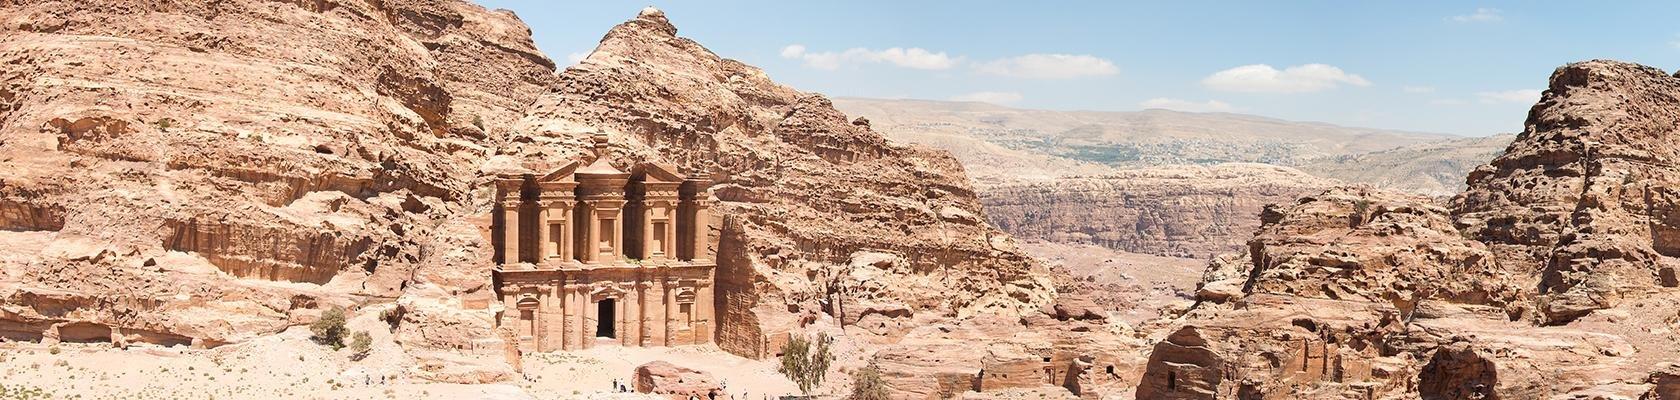 Groepsreizen Midden-Oosten: Jordanië